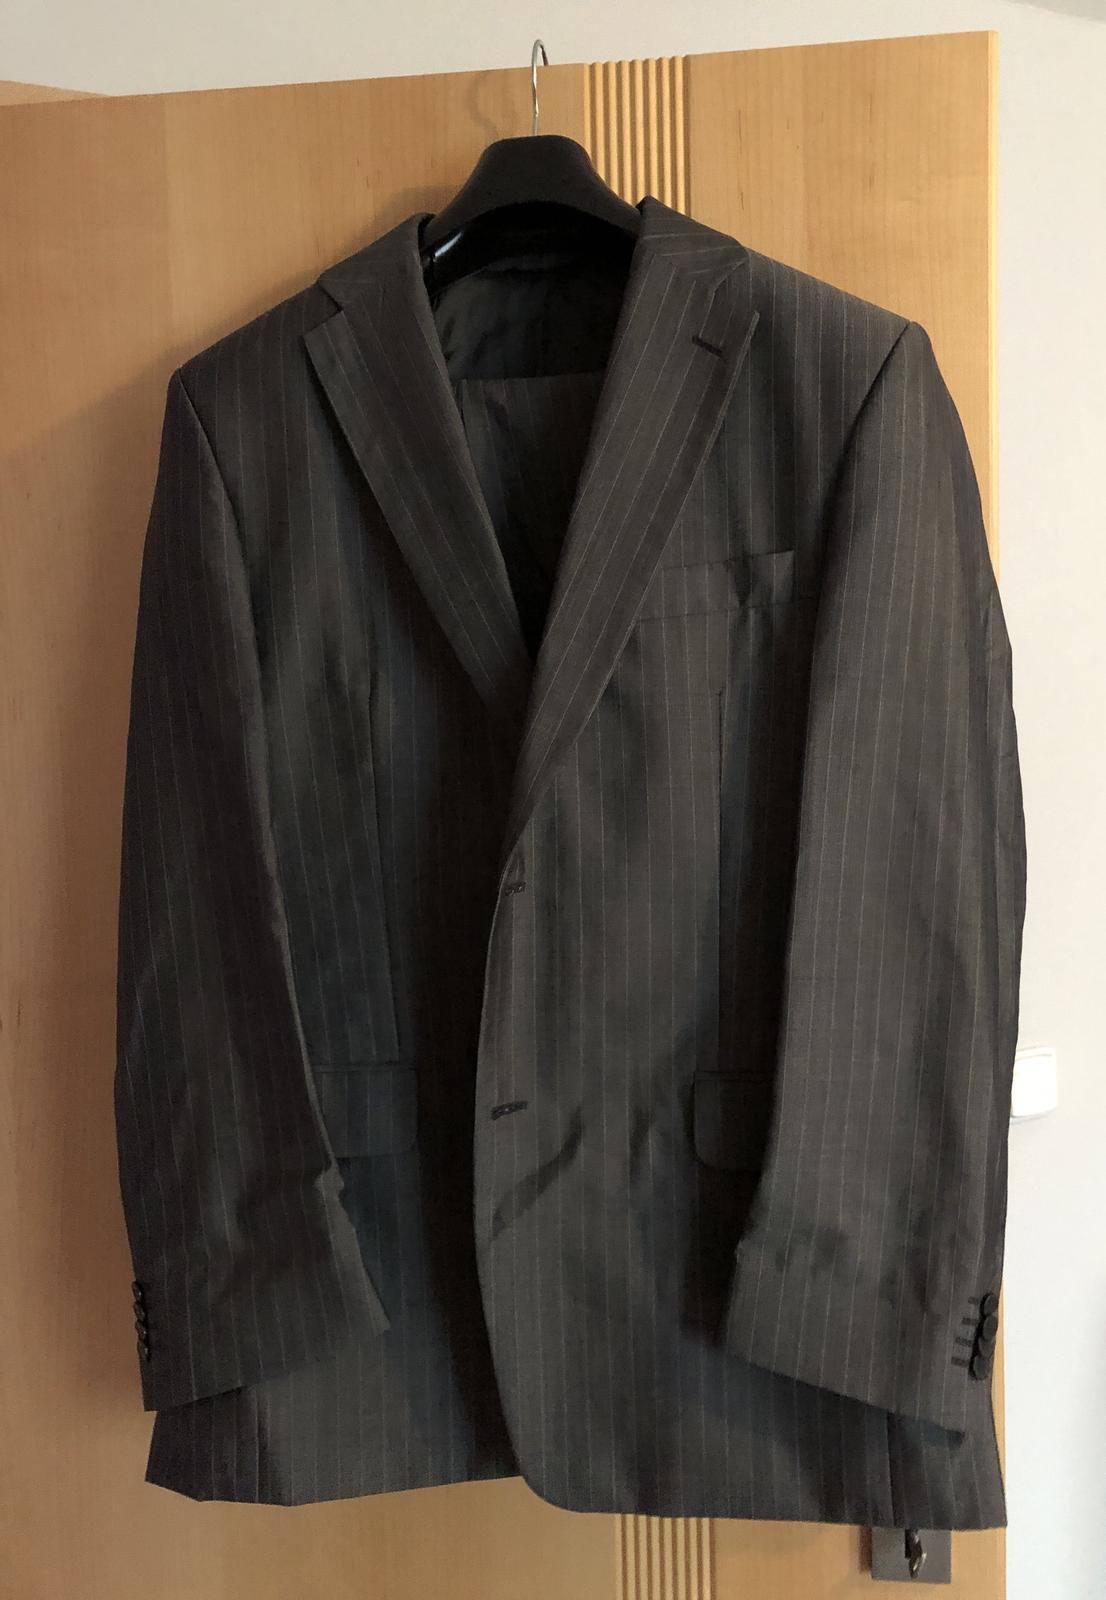 Oblek Blažek - Obrázek č. 1